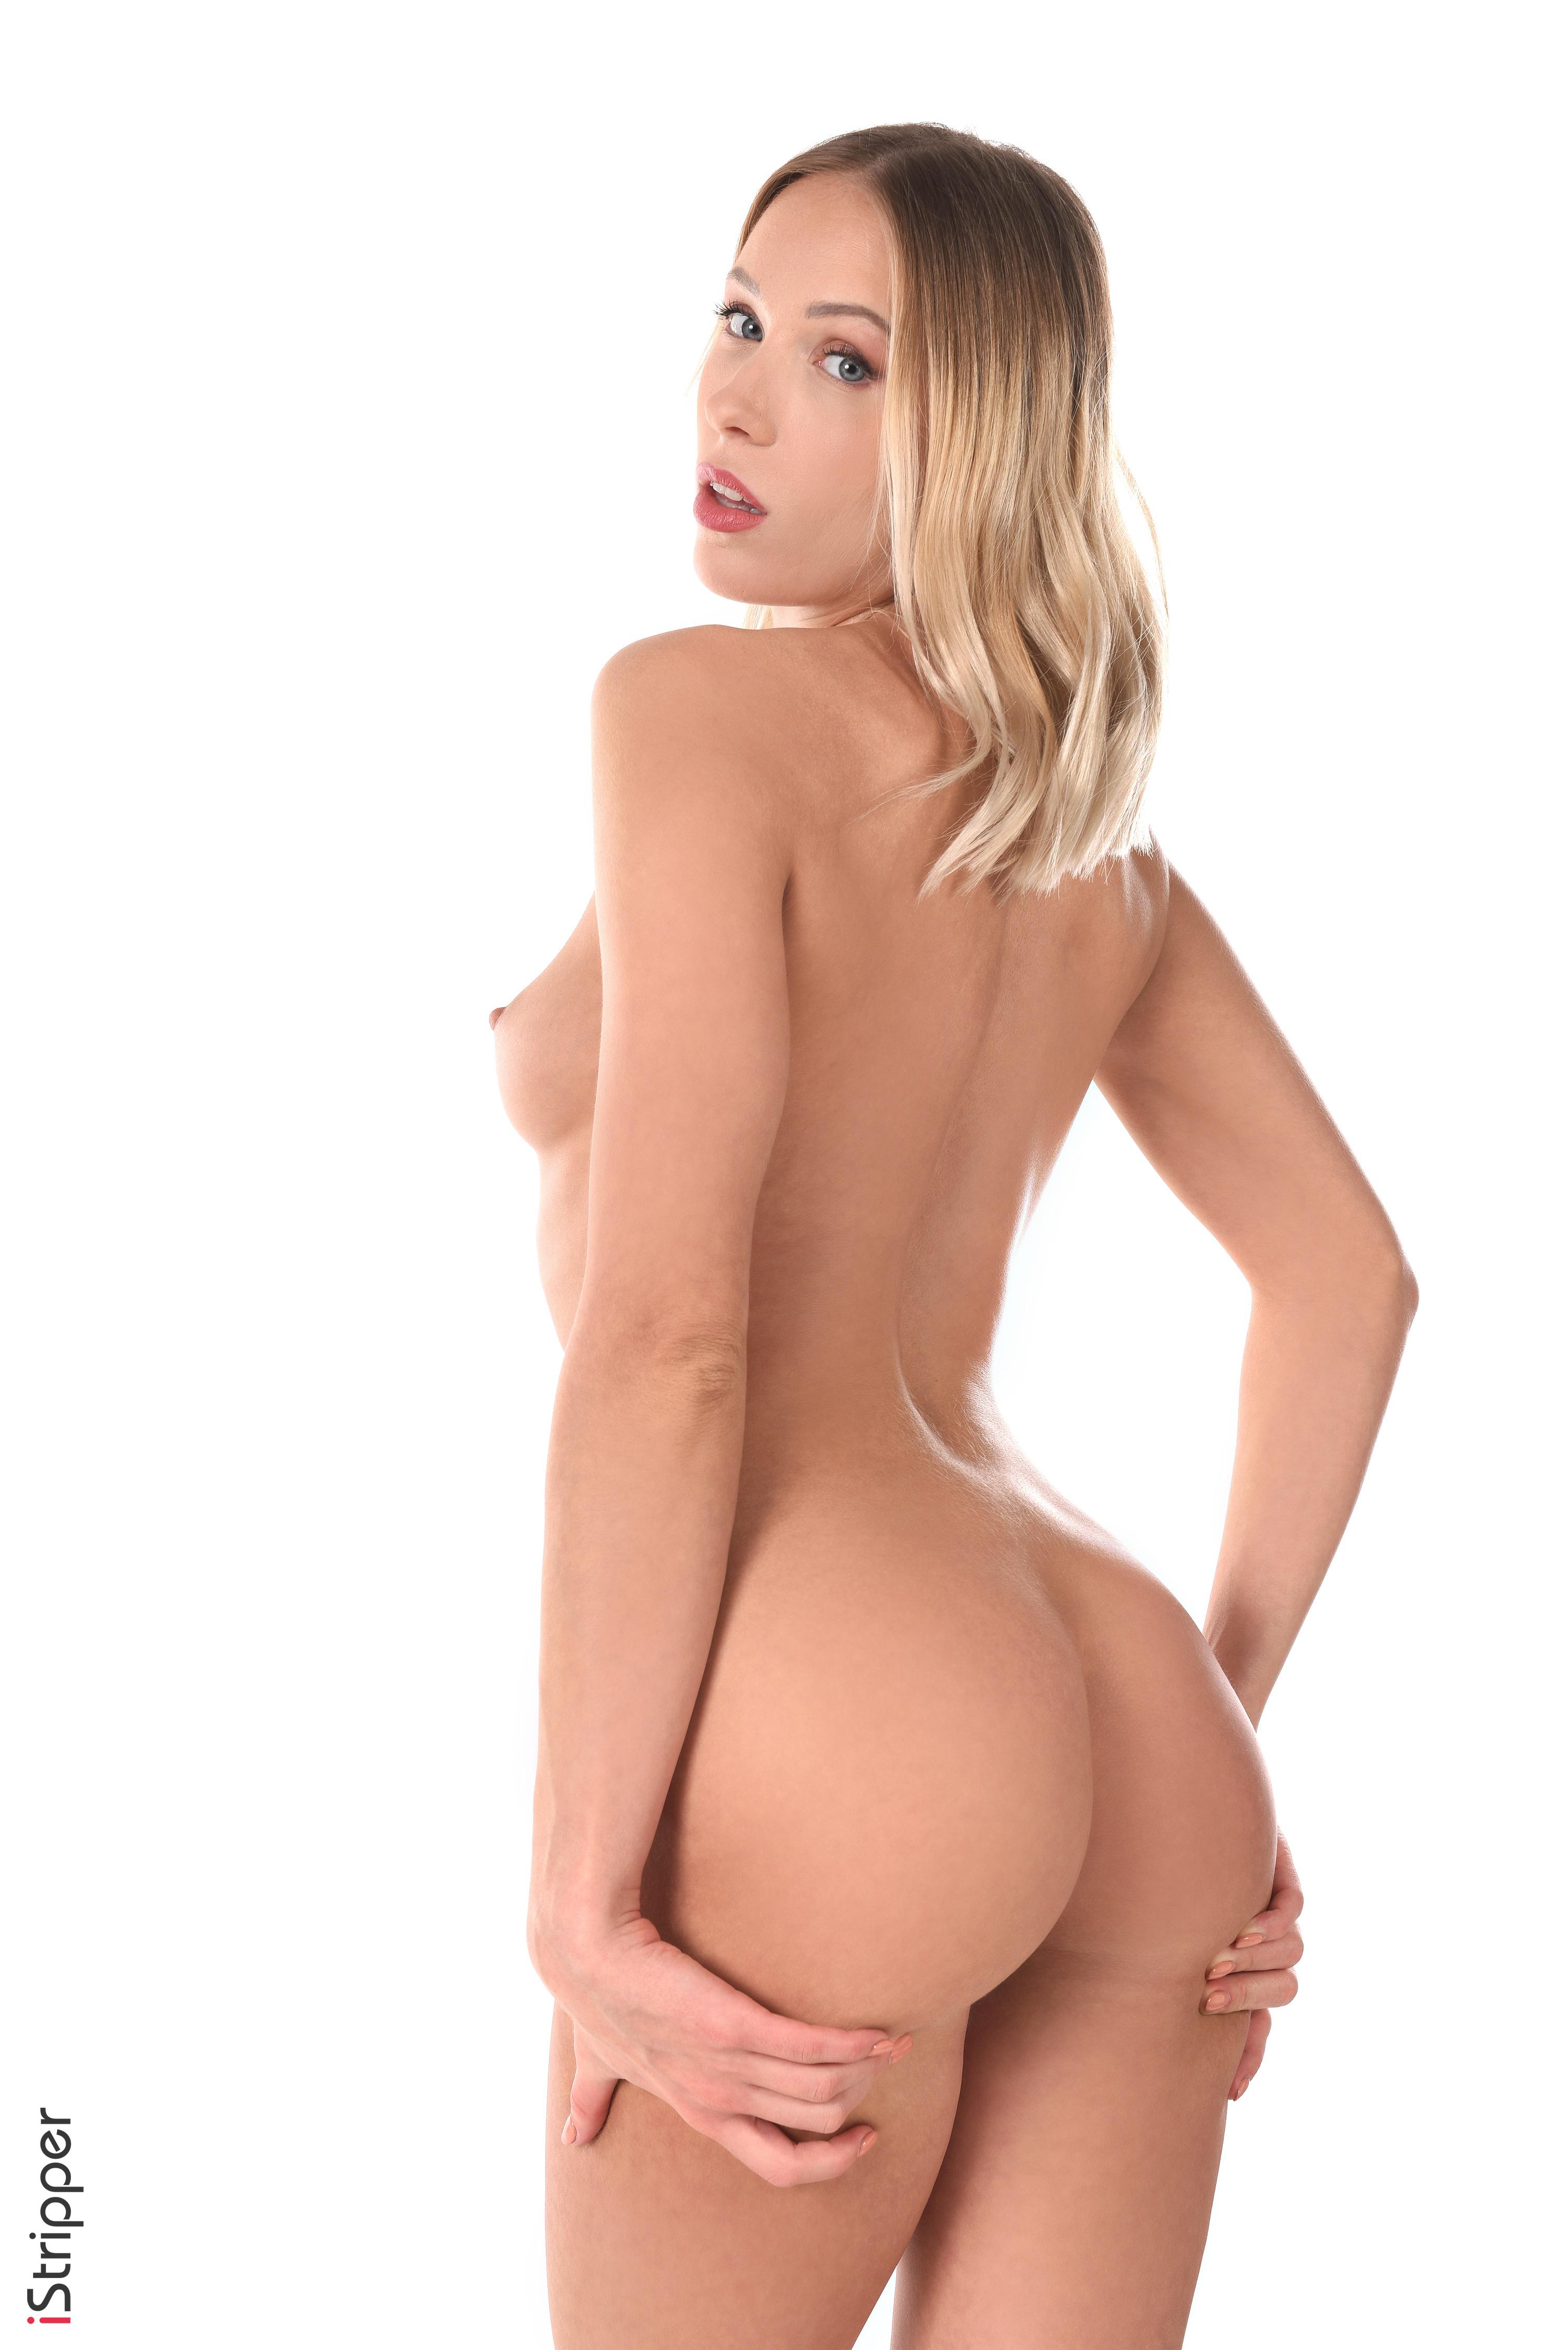 hot naked wallpaper